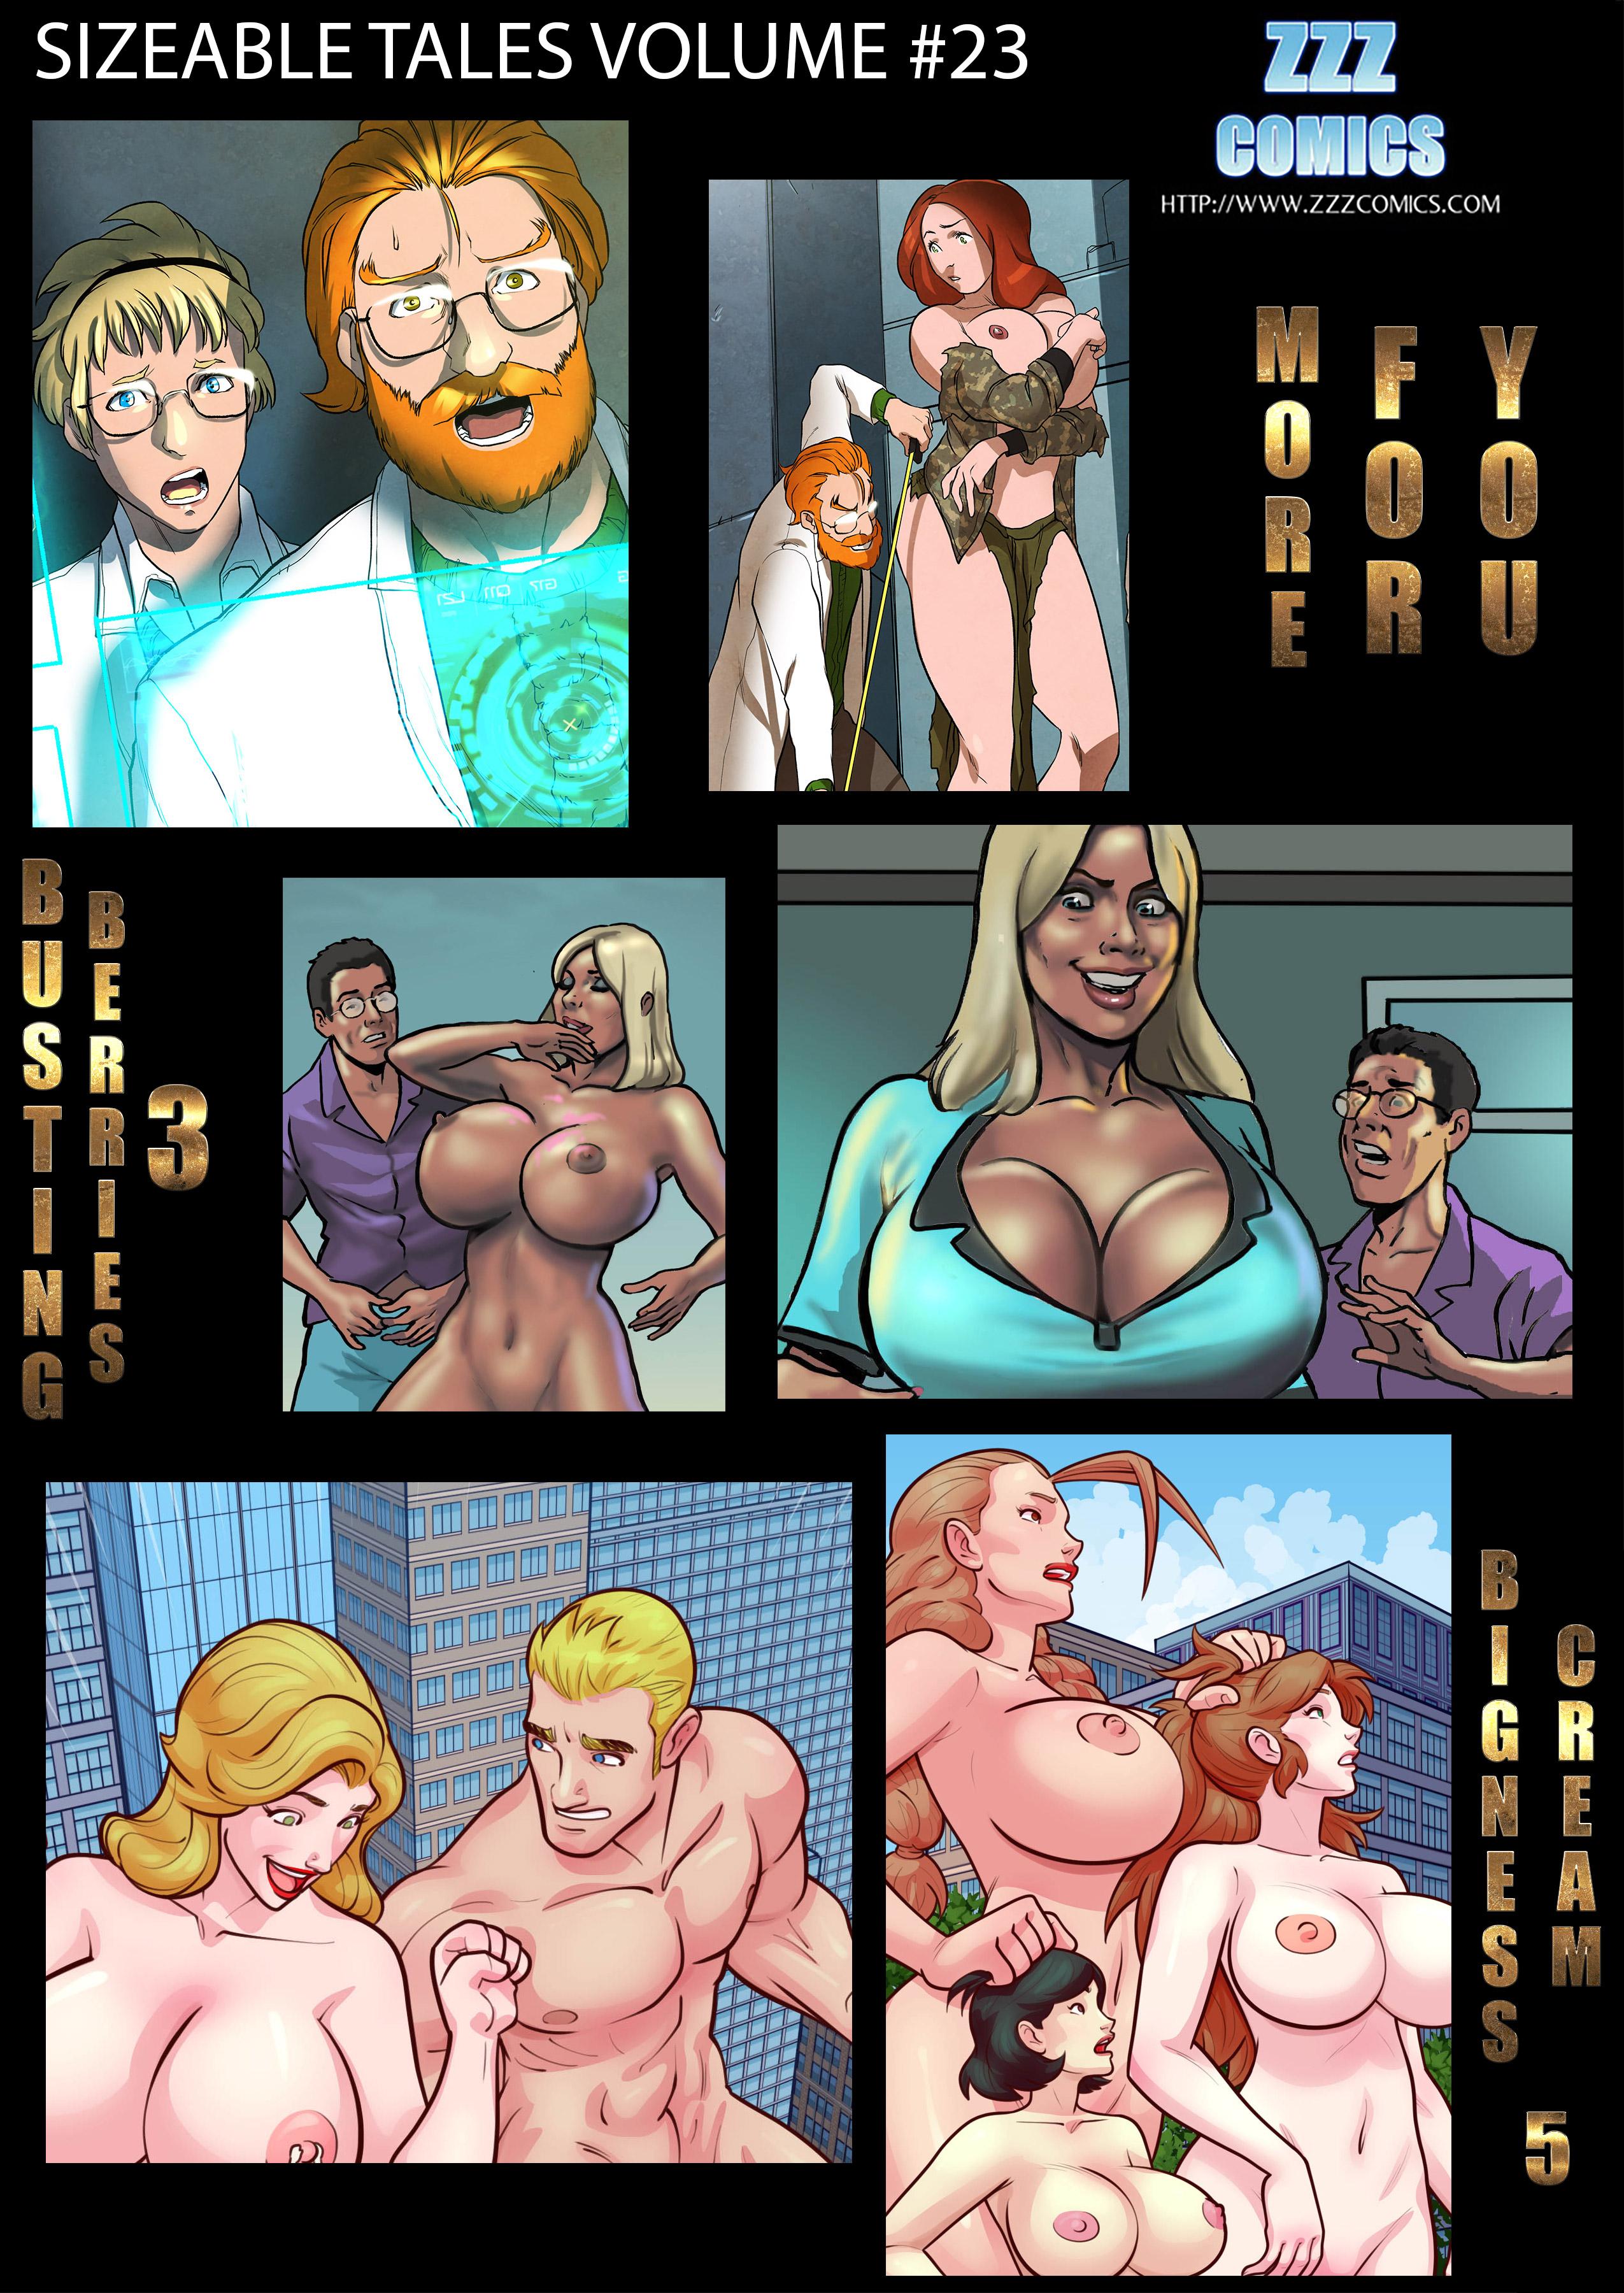 porno sex boobies filmy Baries komiks sex porno